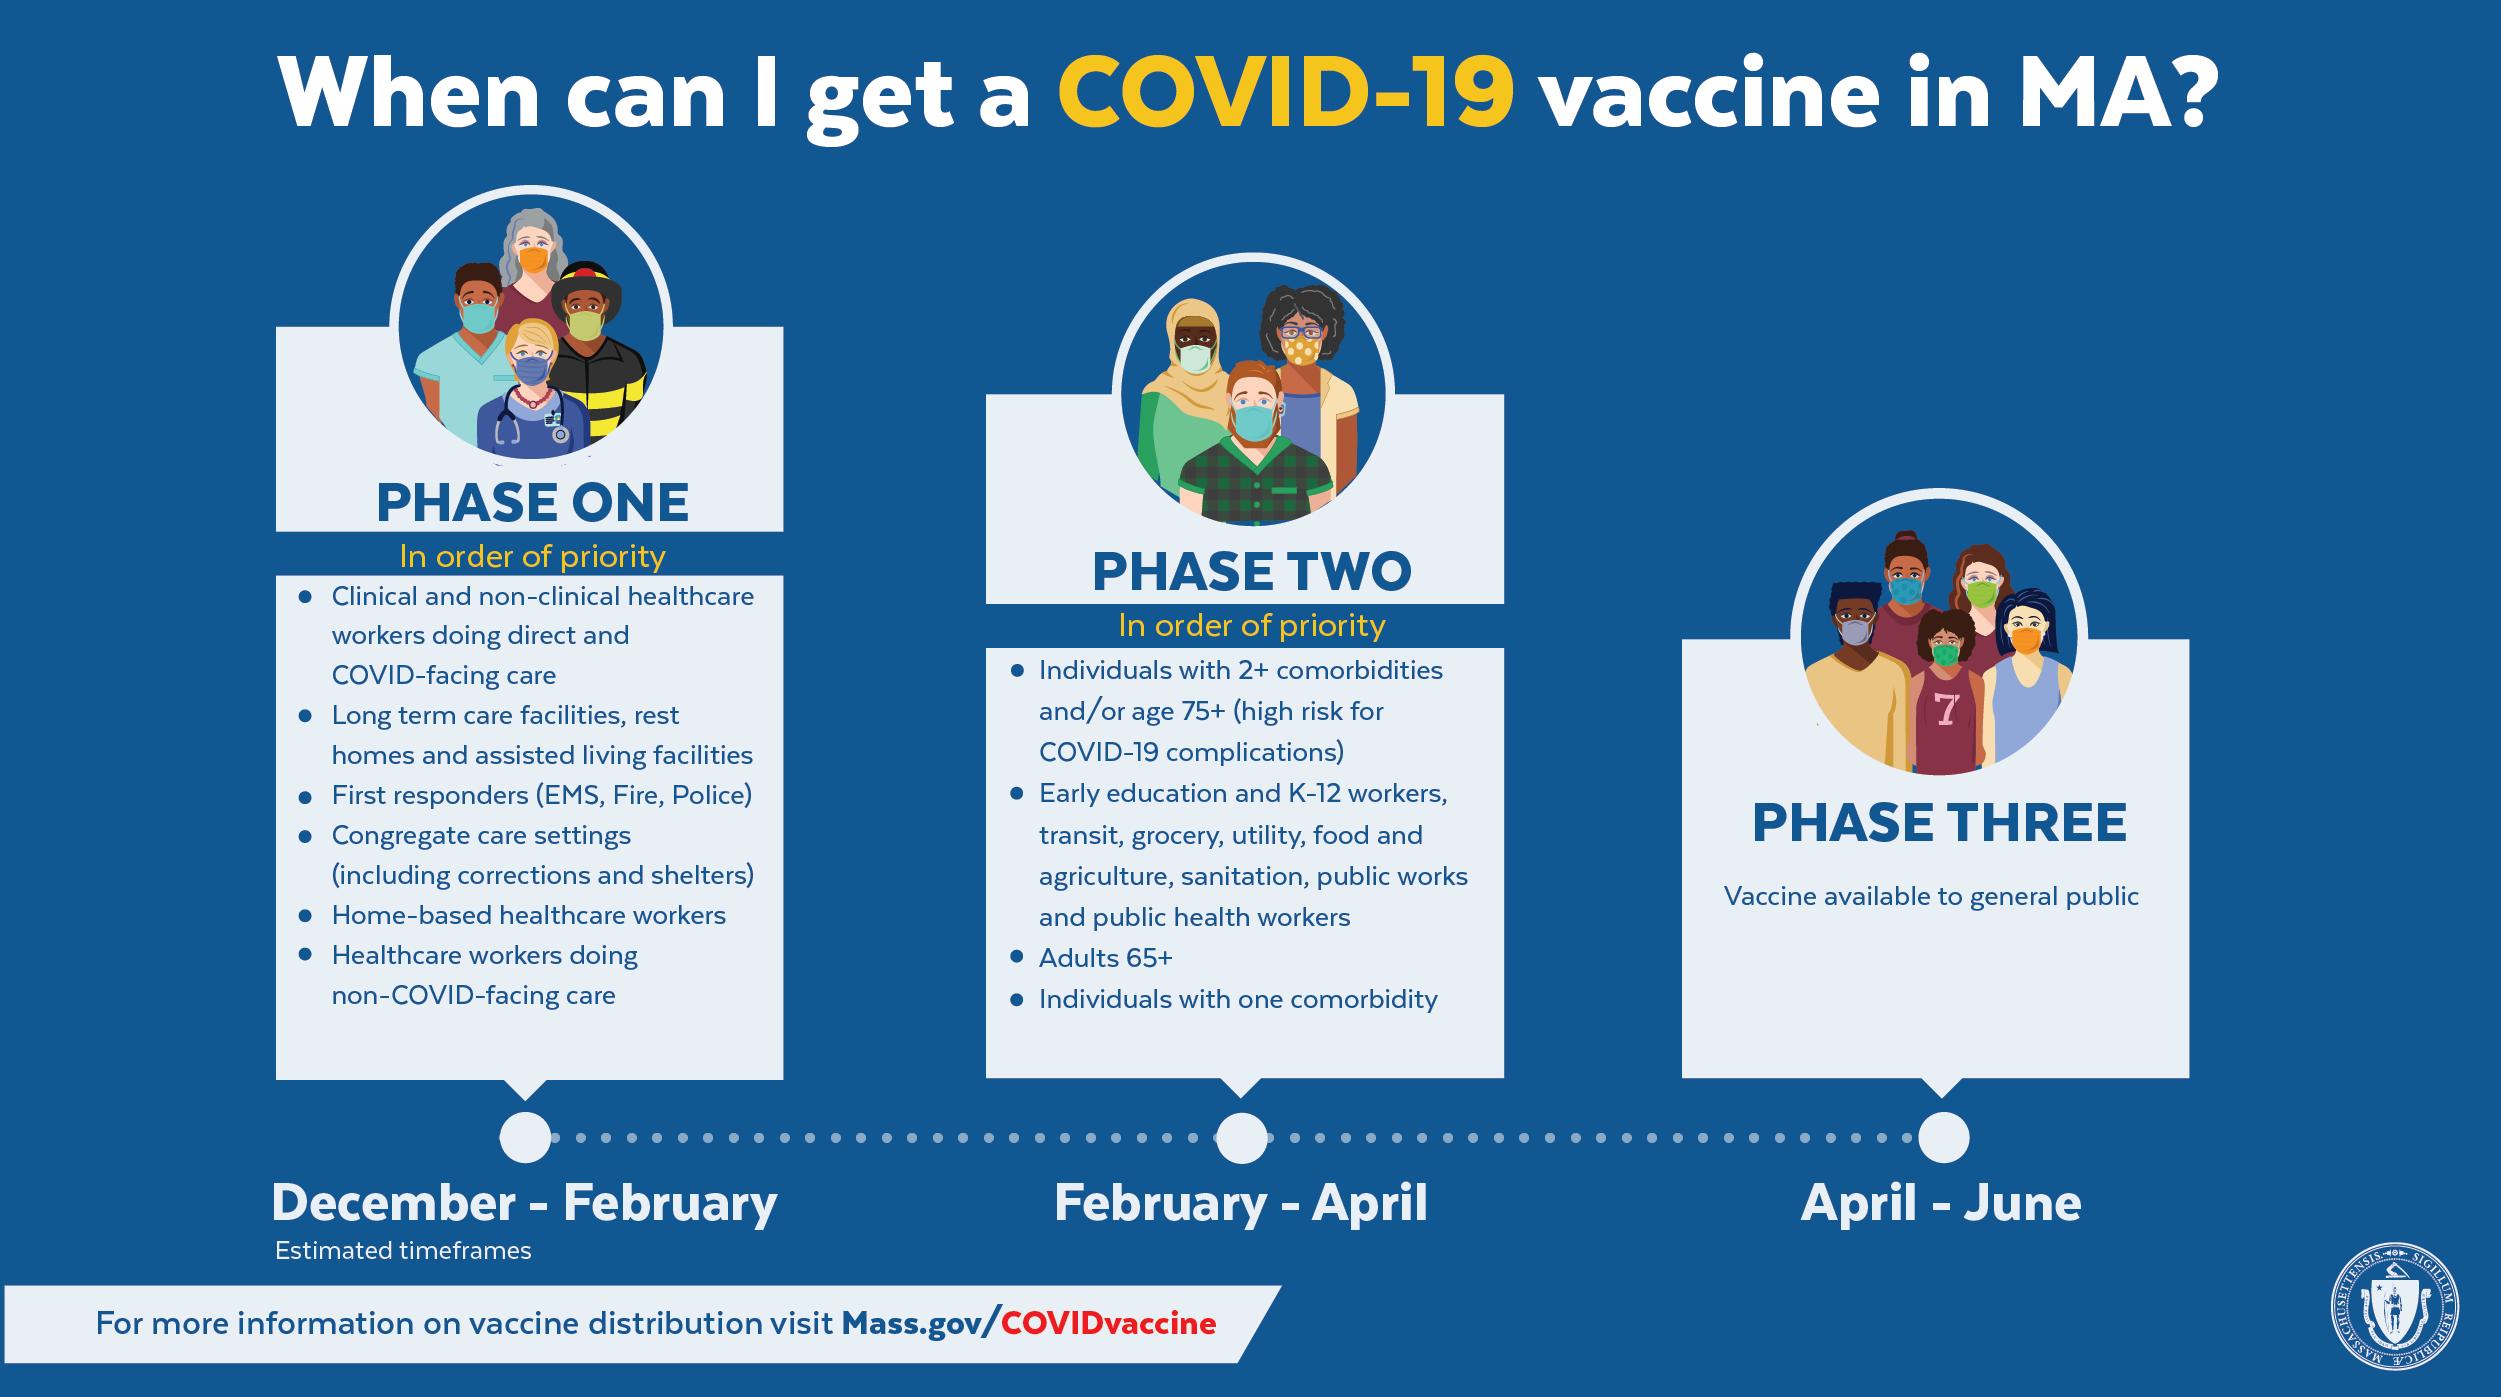 COVID-19 vaccine phases in Massachusetts